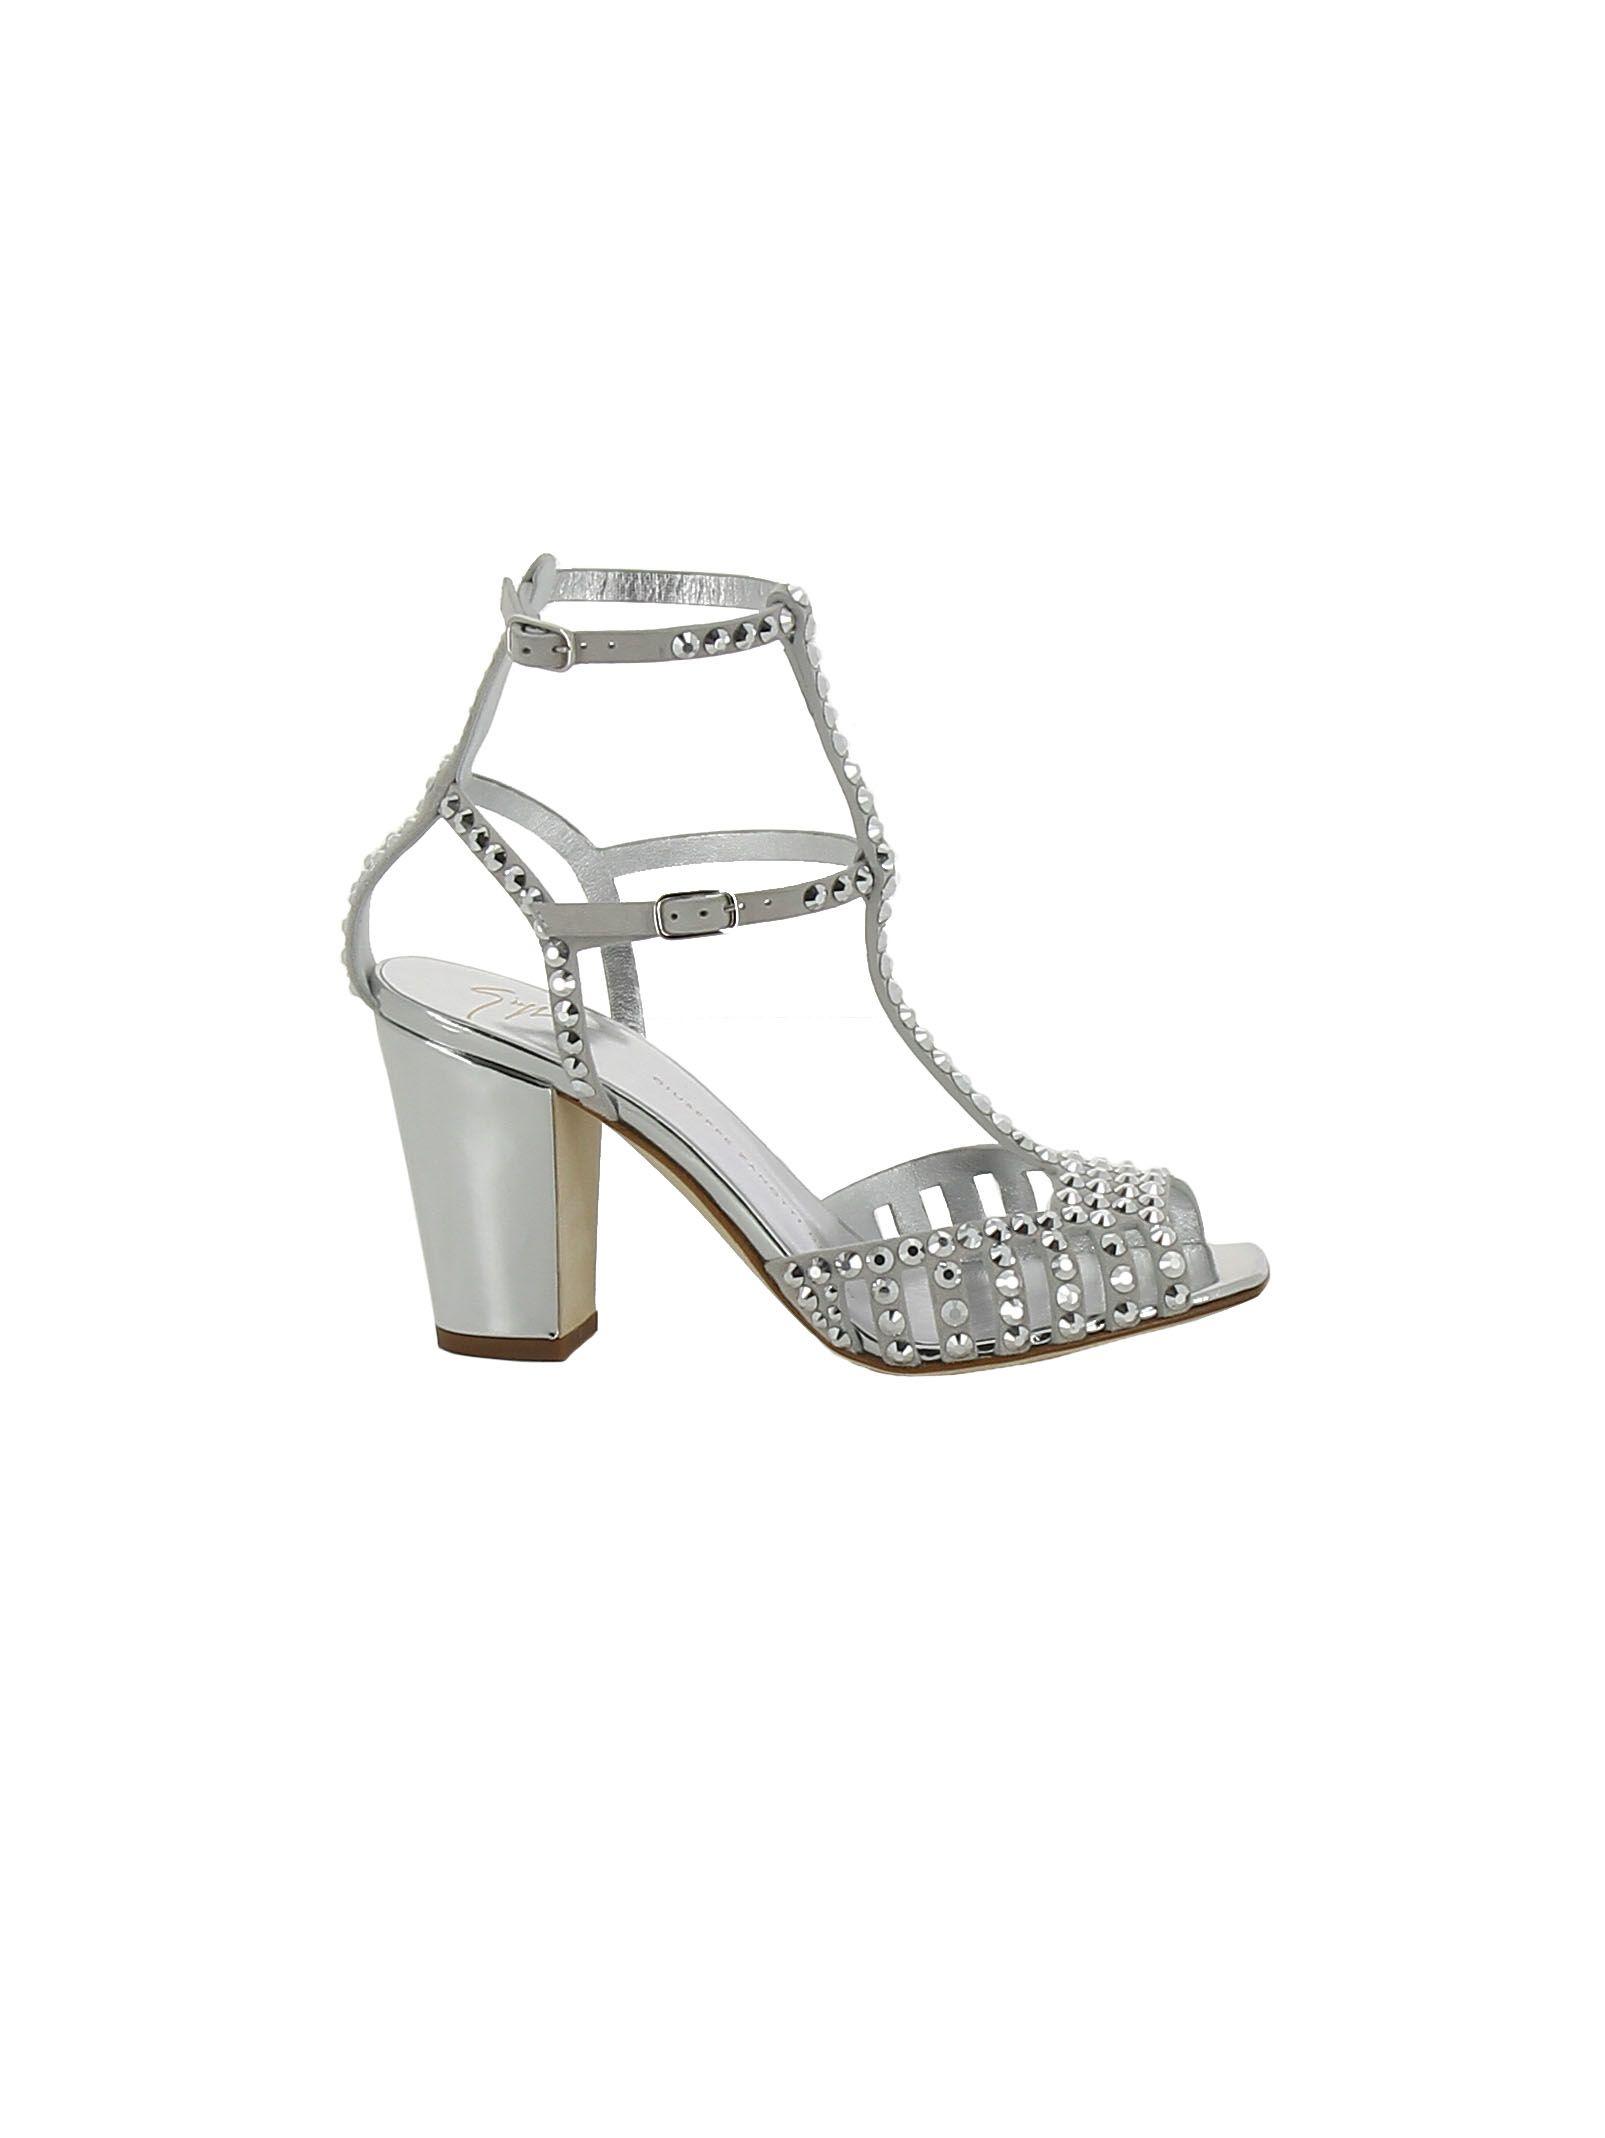 Giuseppe Zanotti Studded Caged Sandals